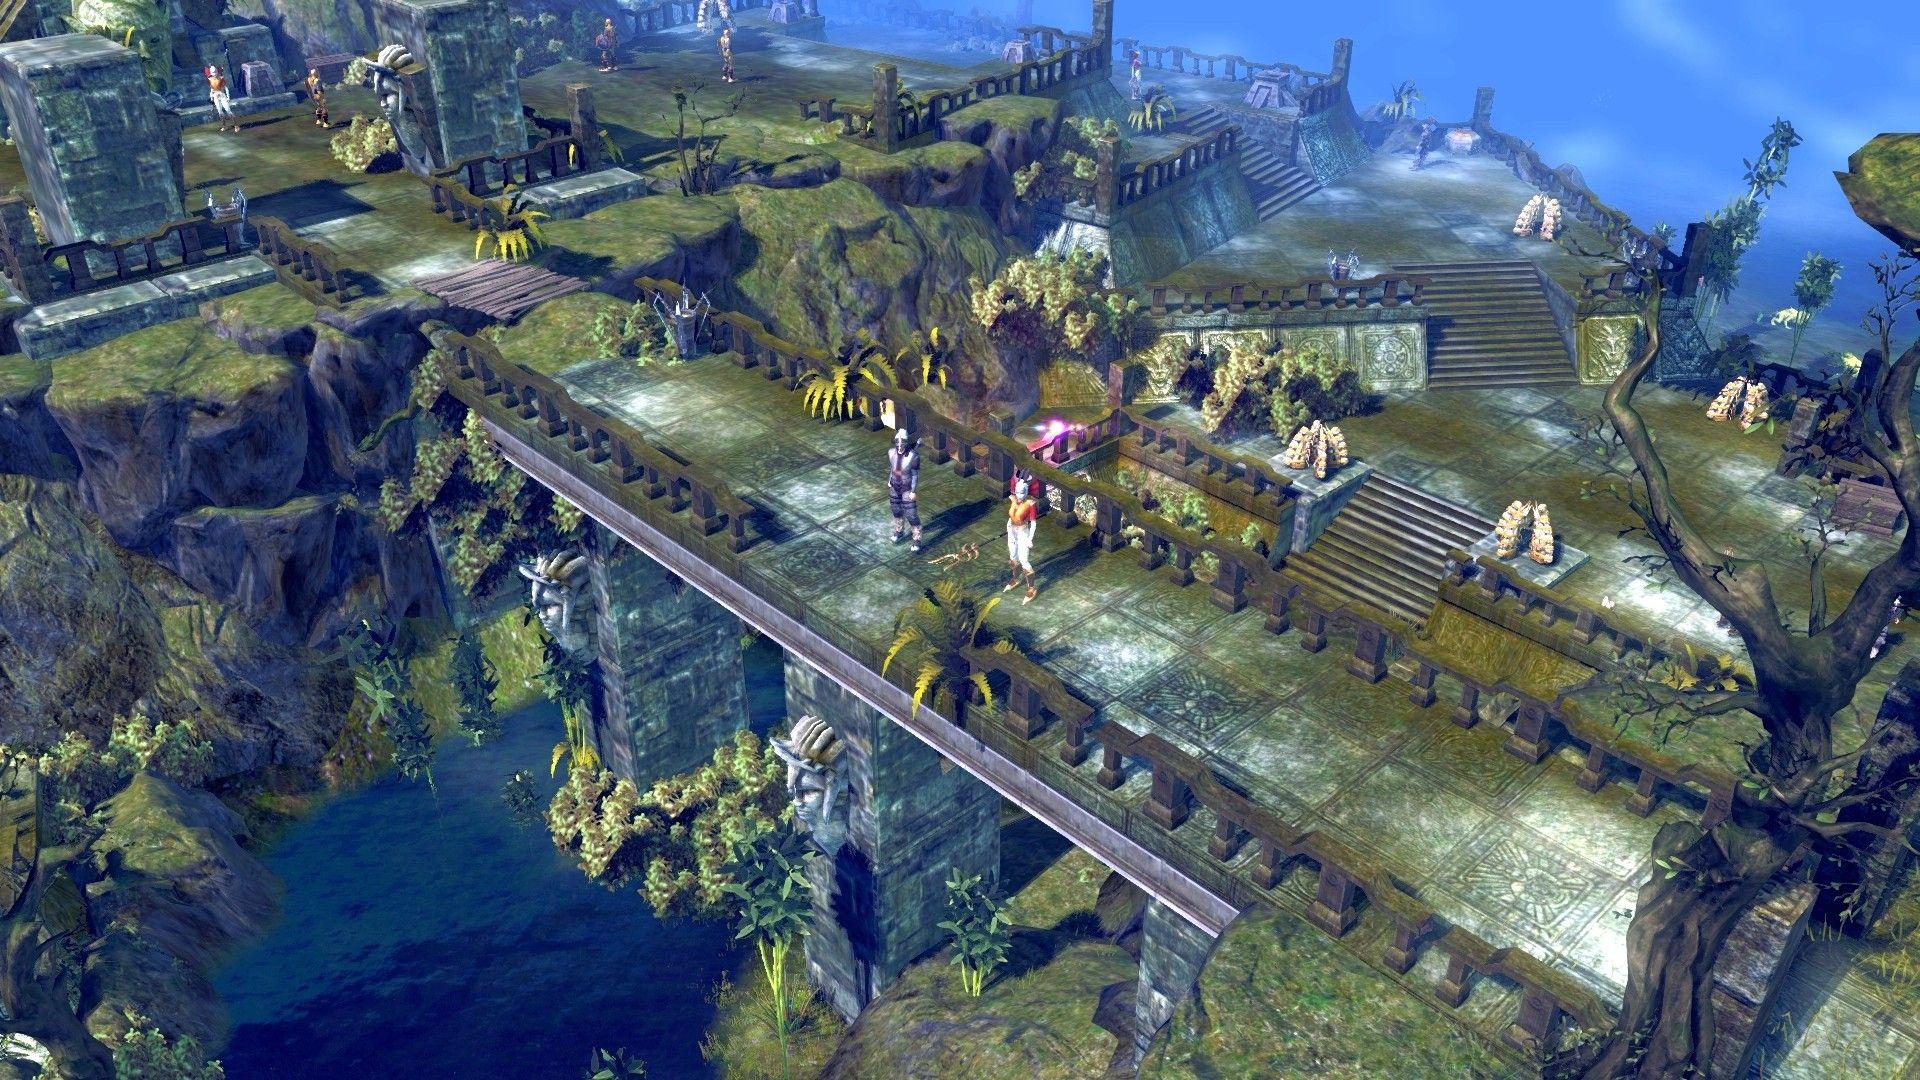 видеоурок по созданию rpg игры